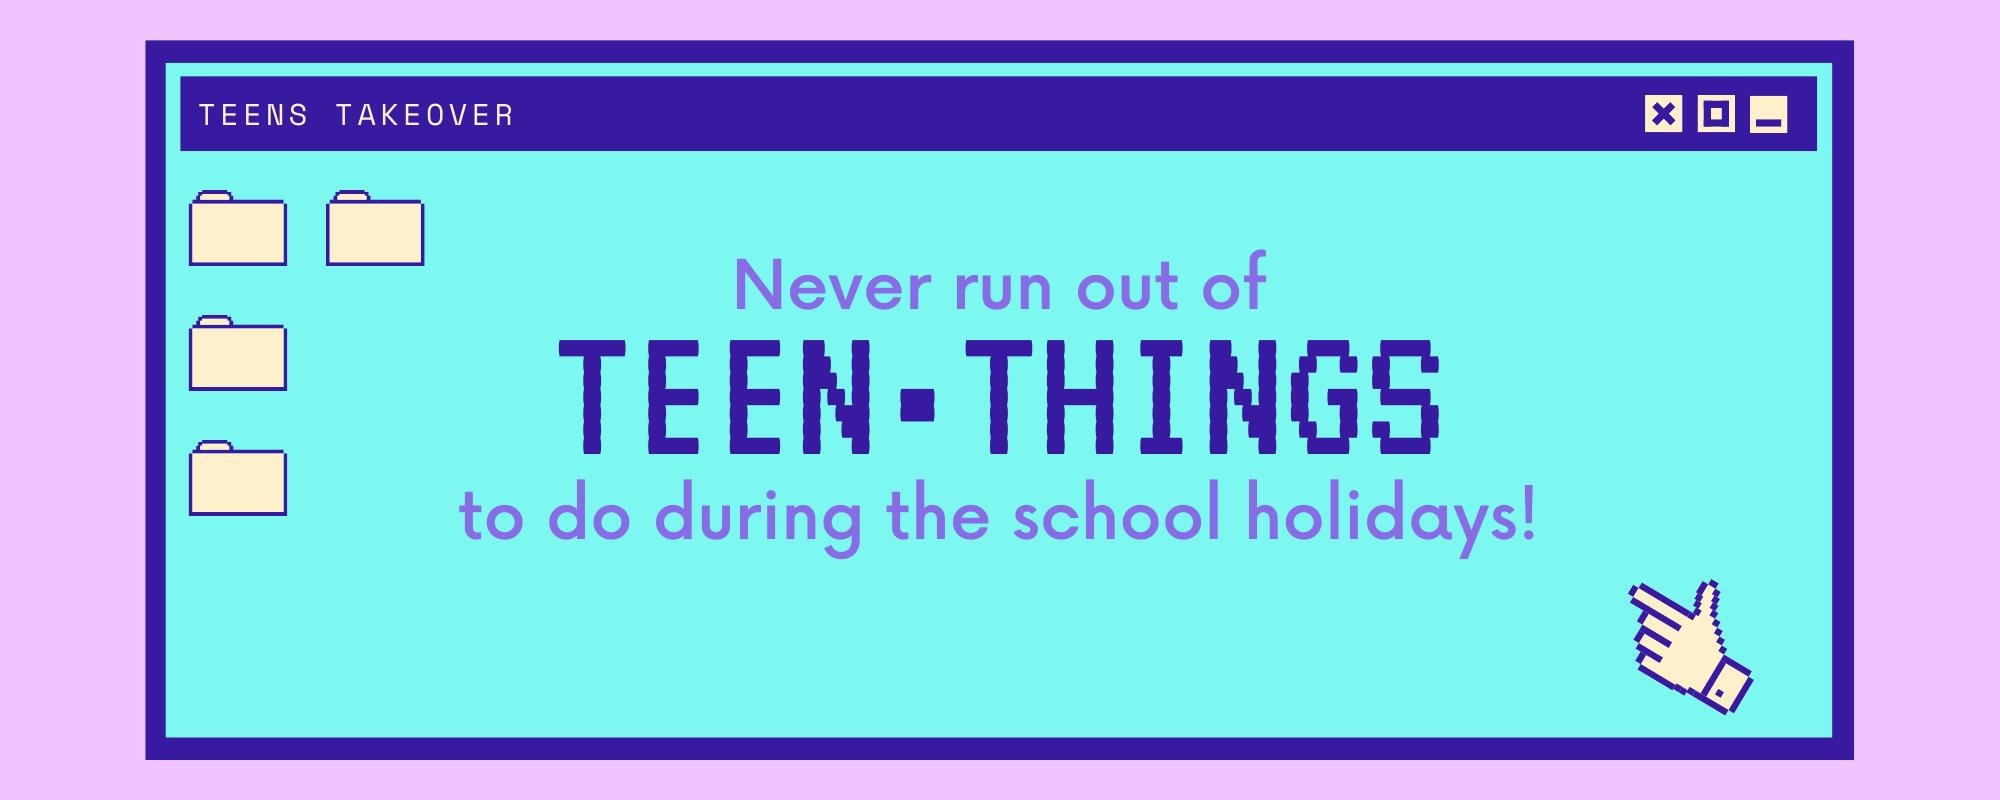 Teen things logo